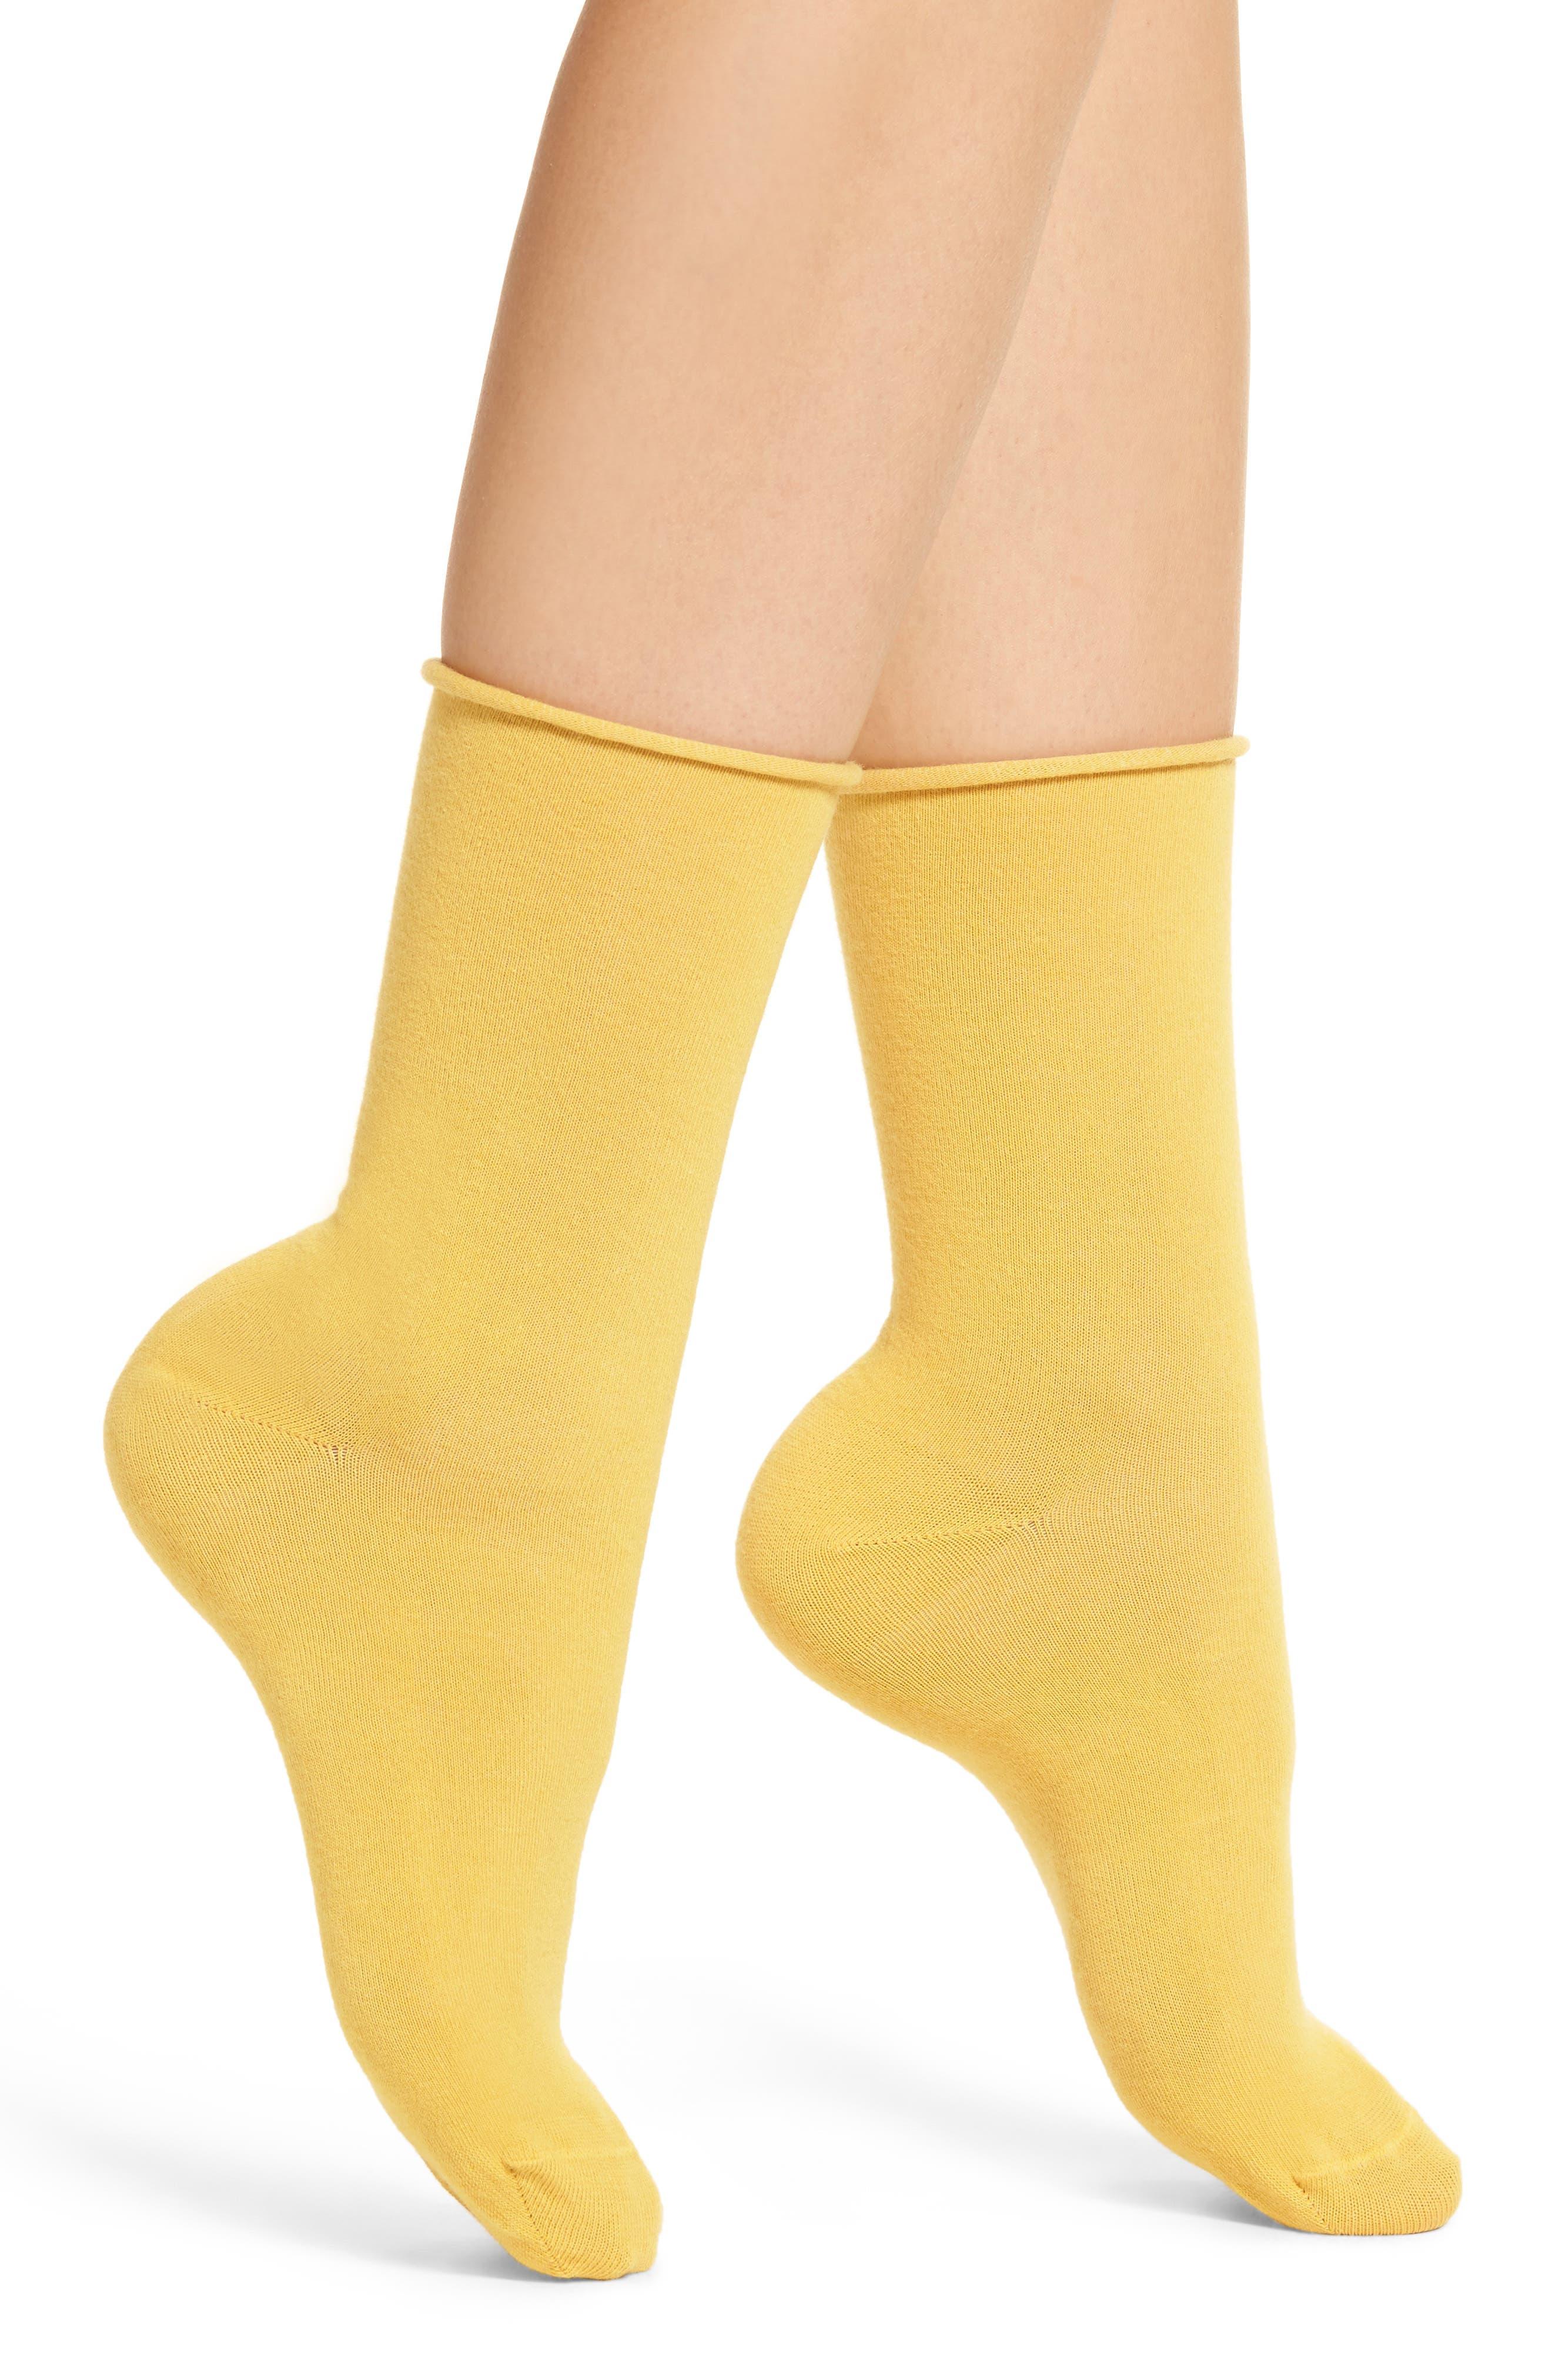 Treasure&Bond 'Everyday' Roll Top Socks